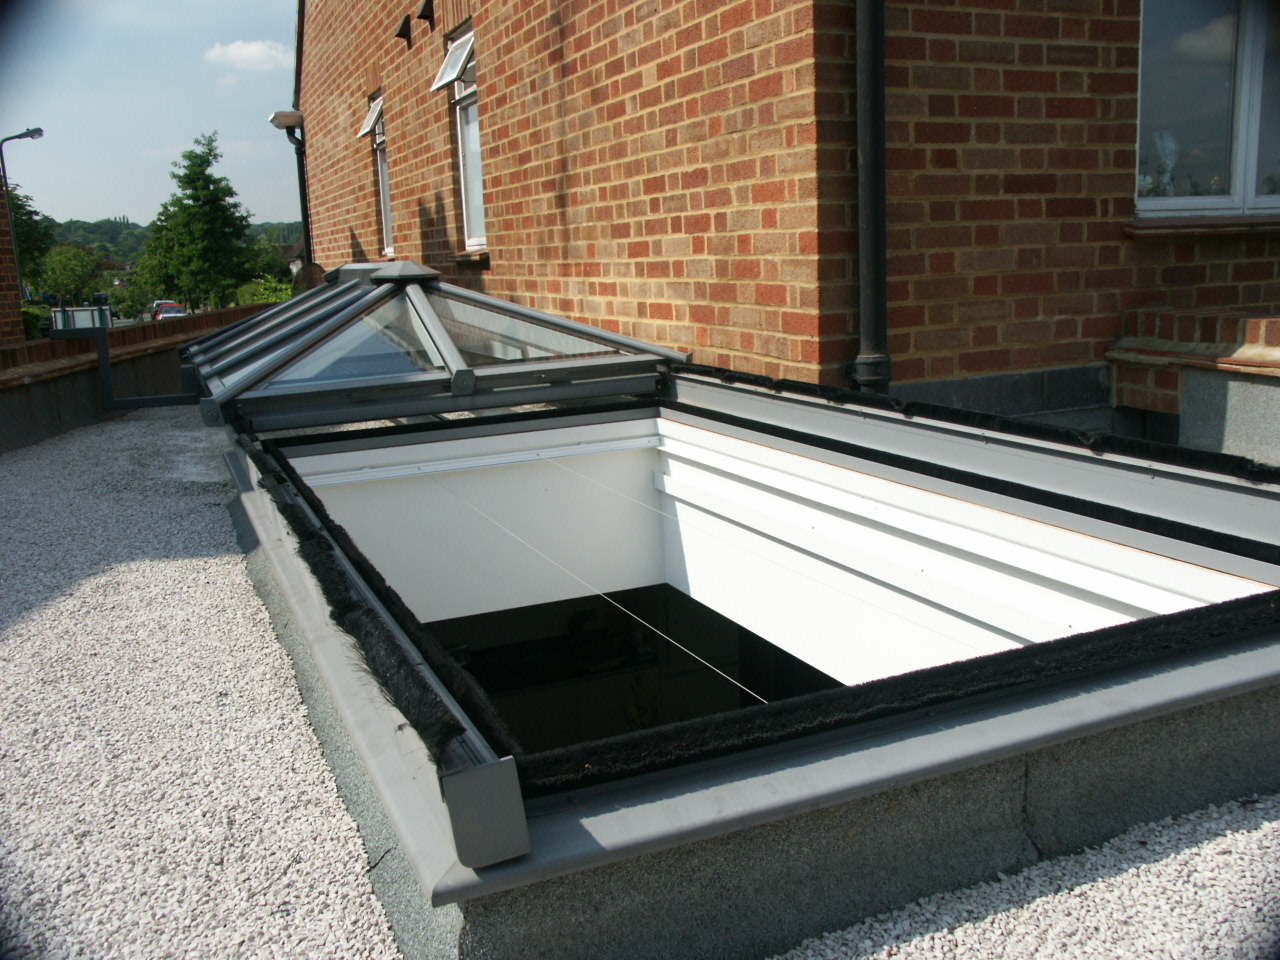 HRSFLD Fully Retracting, Slide Open, Hipped Glazed Roof, Rooflight, Skylight, Roof Lantern